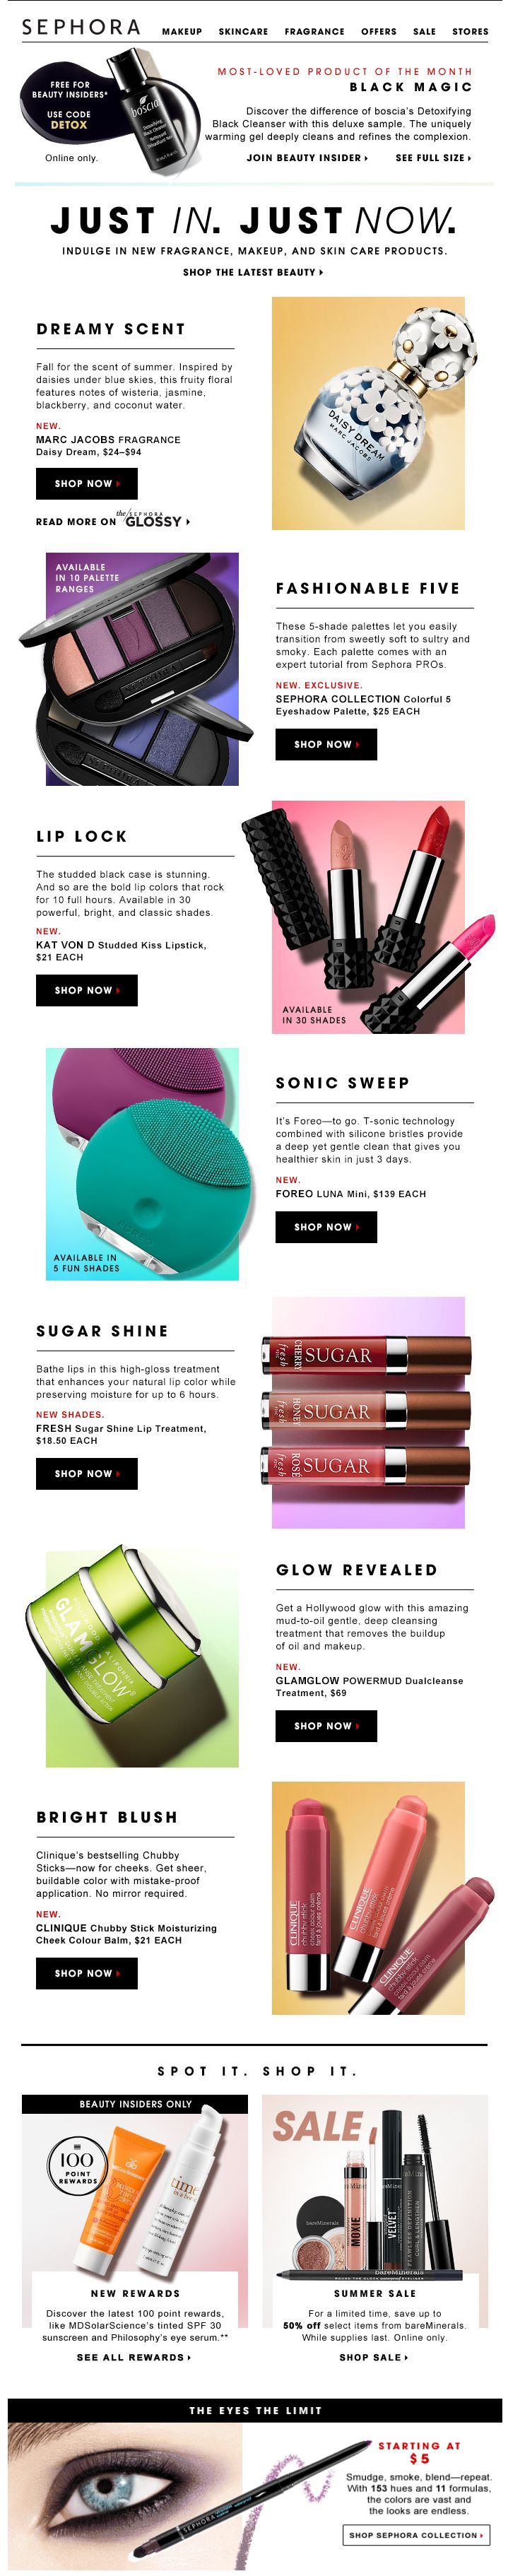 Sephora NL